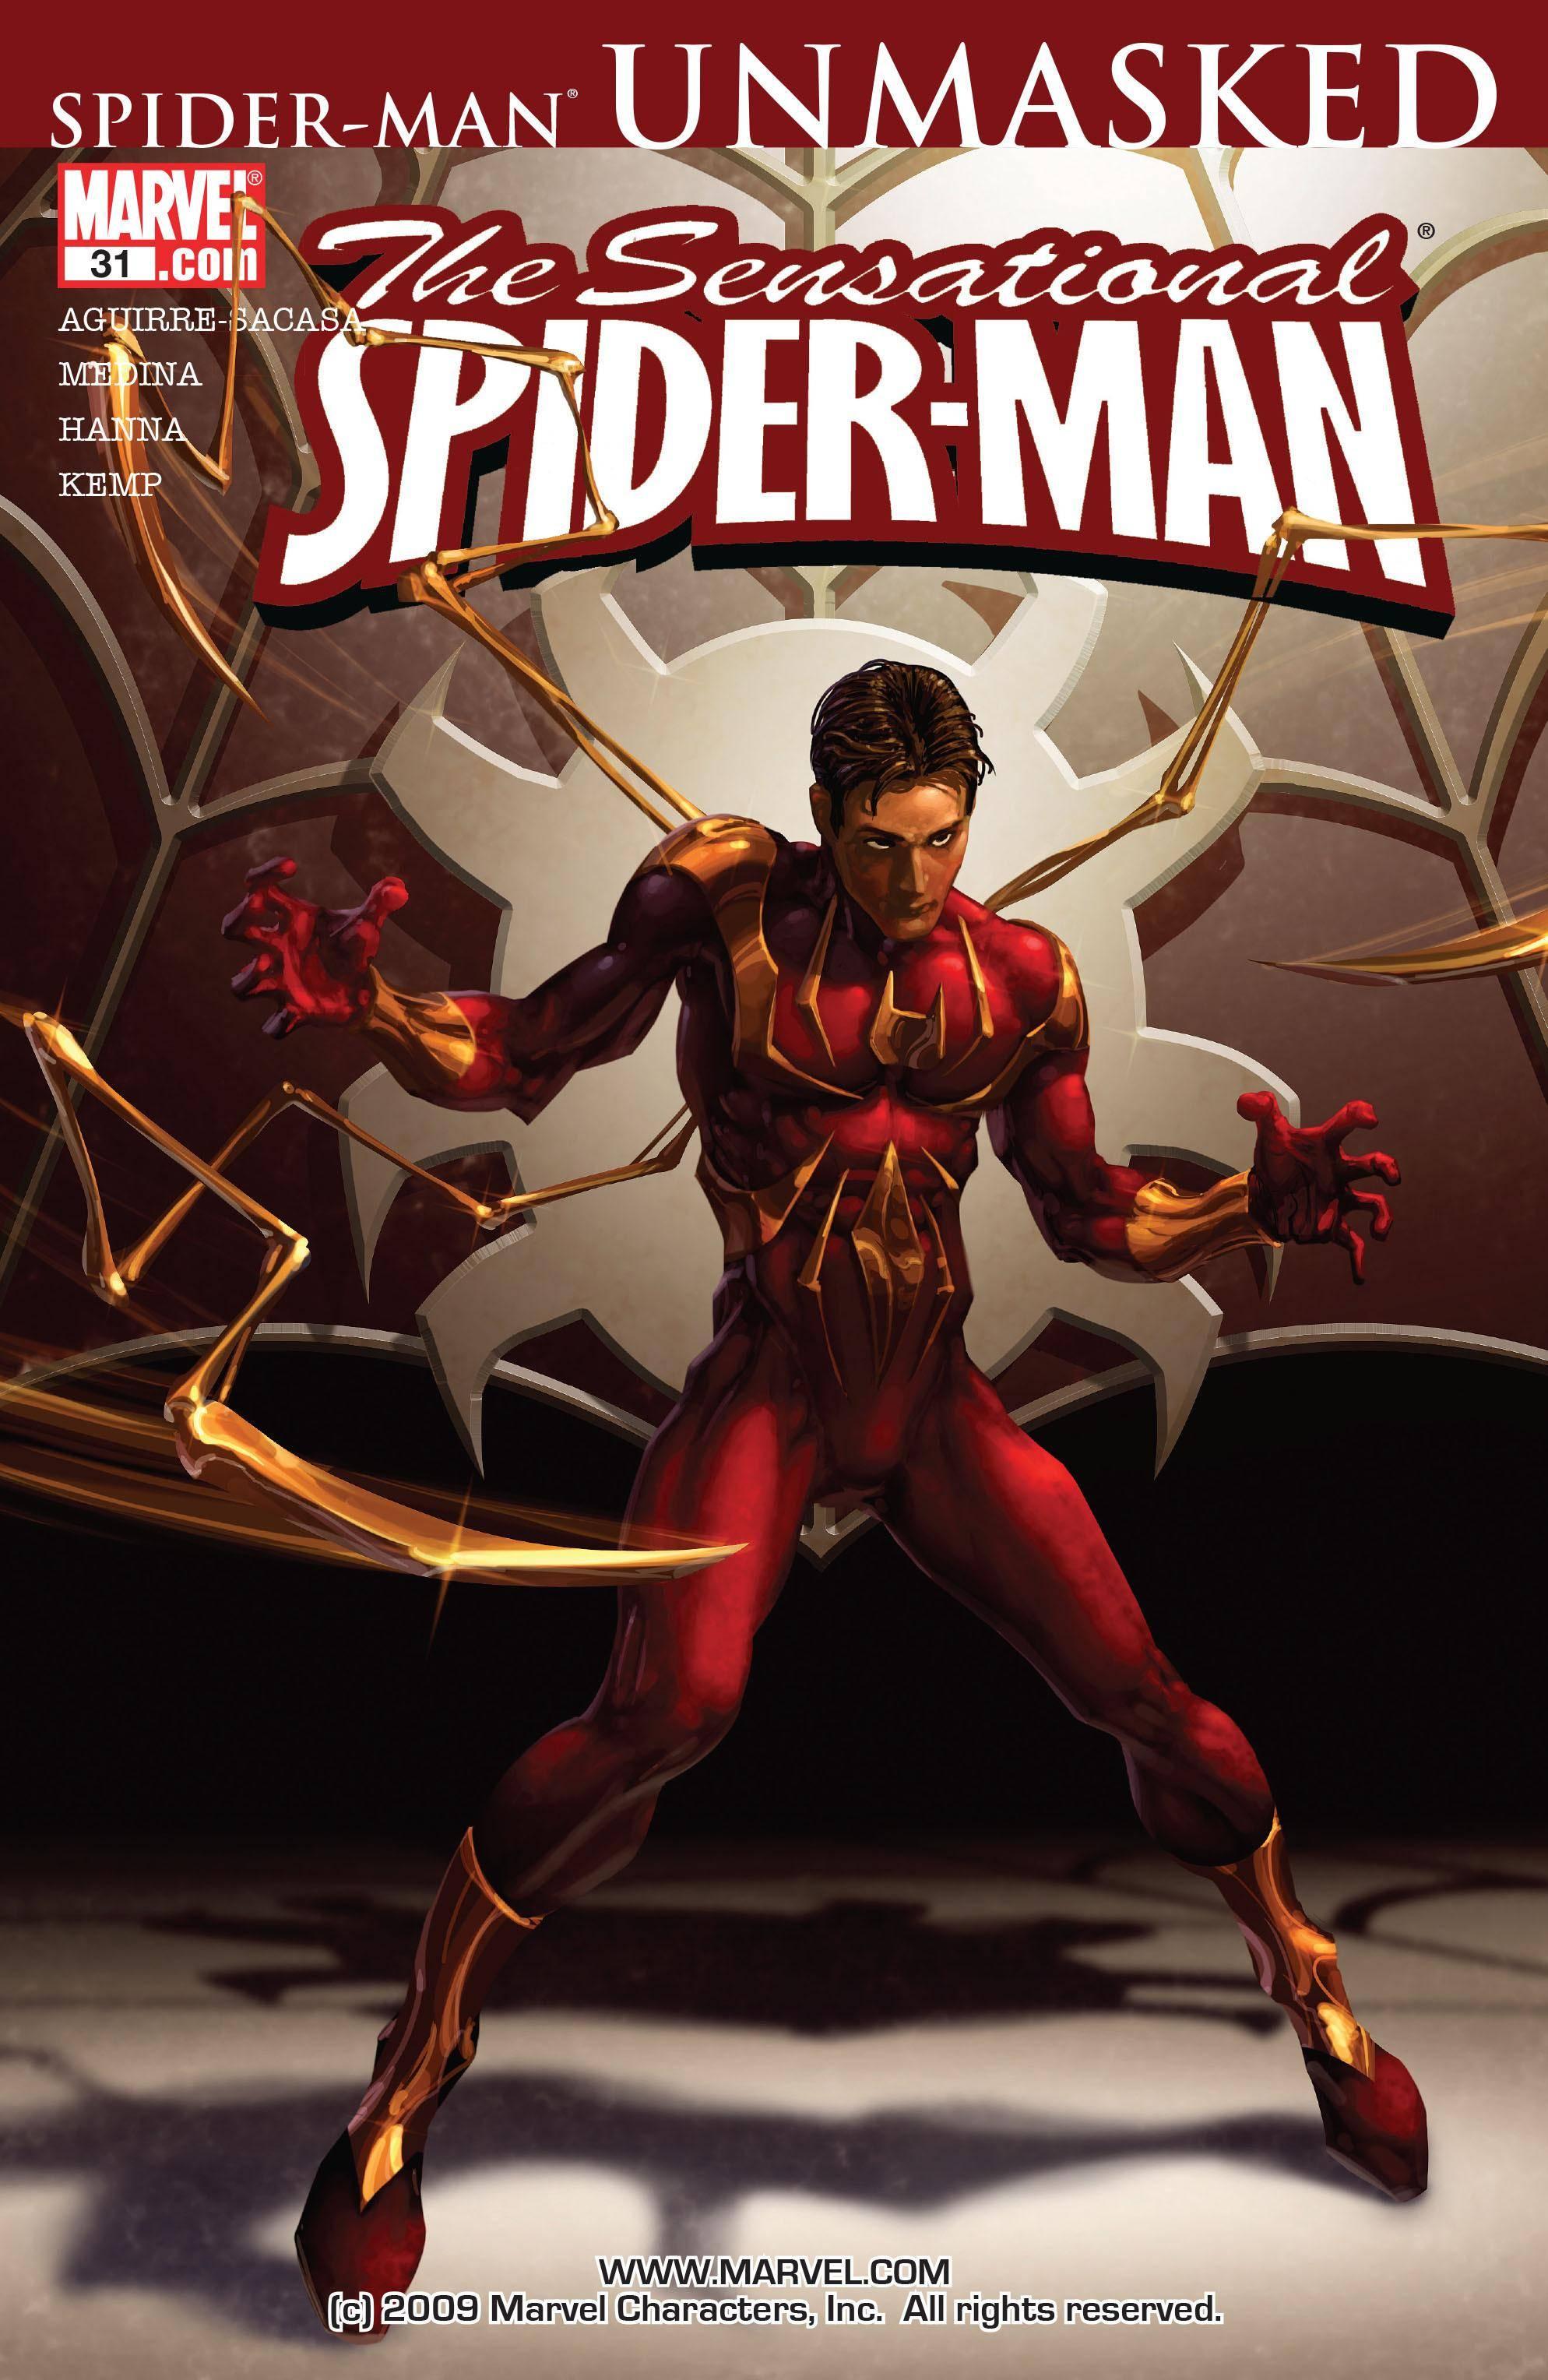 The Sensational Spider-Man 031 2006 digital